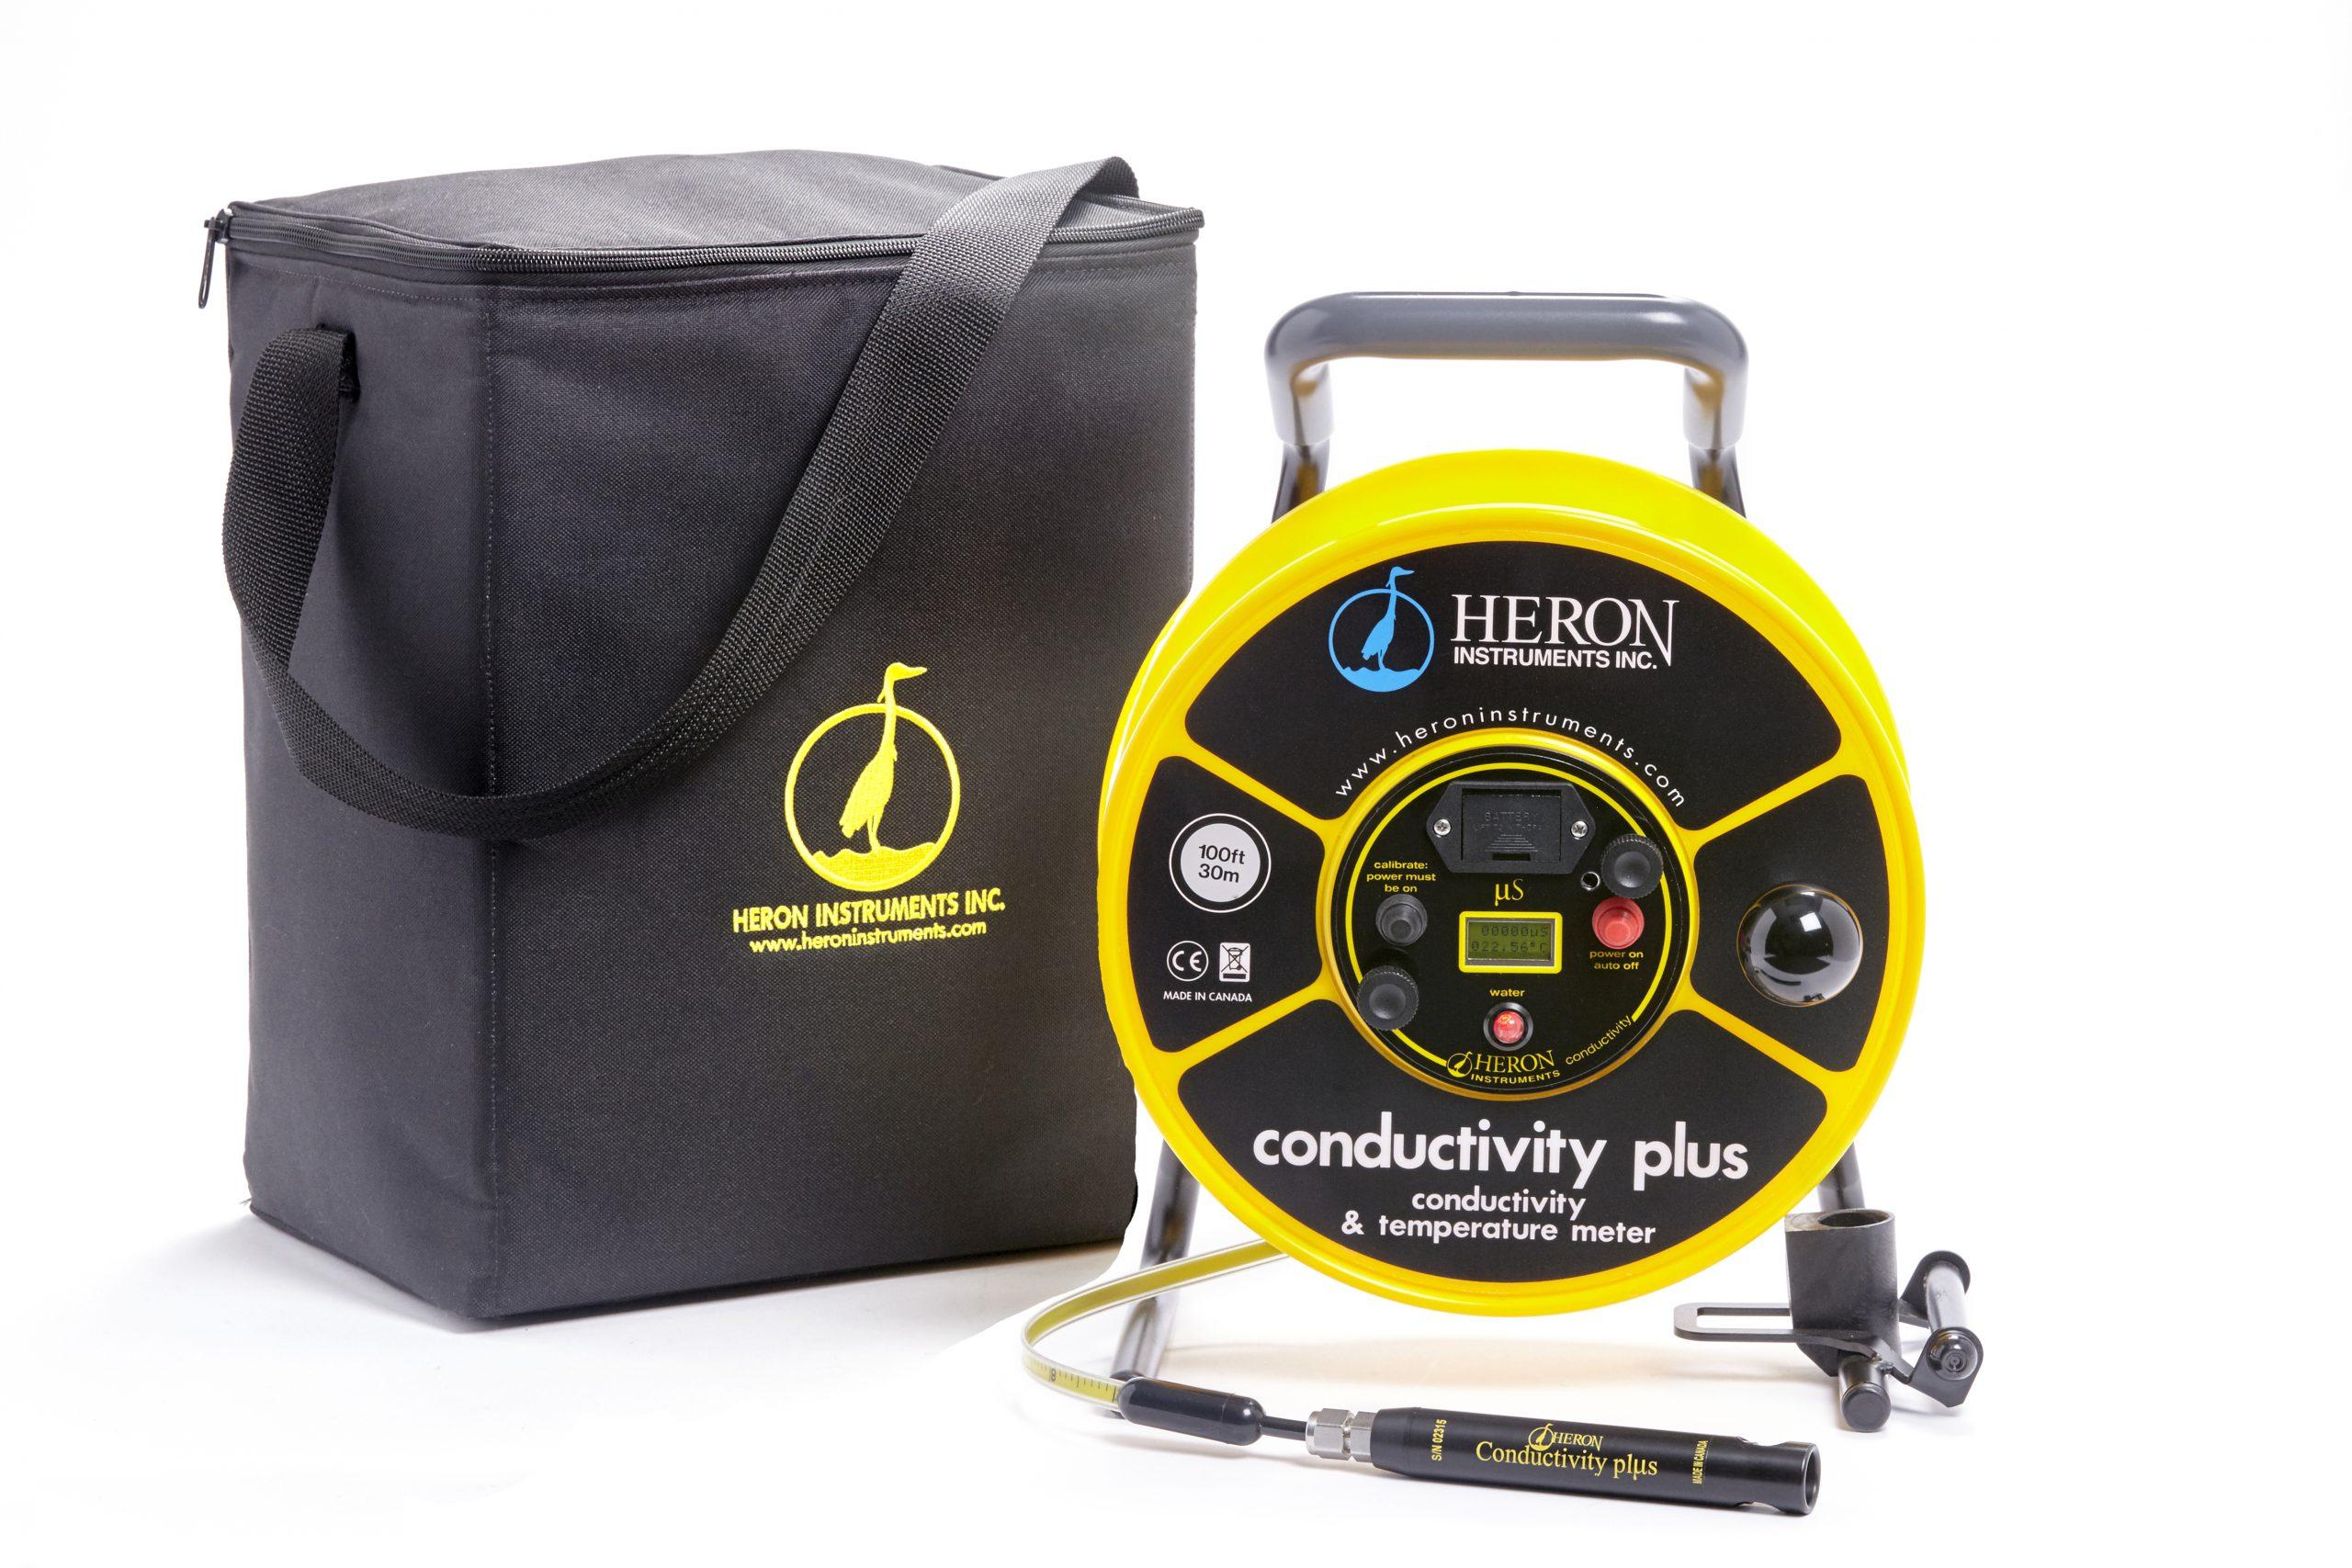 conductivity plus conductivity and temperature meter